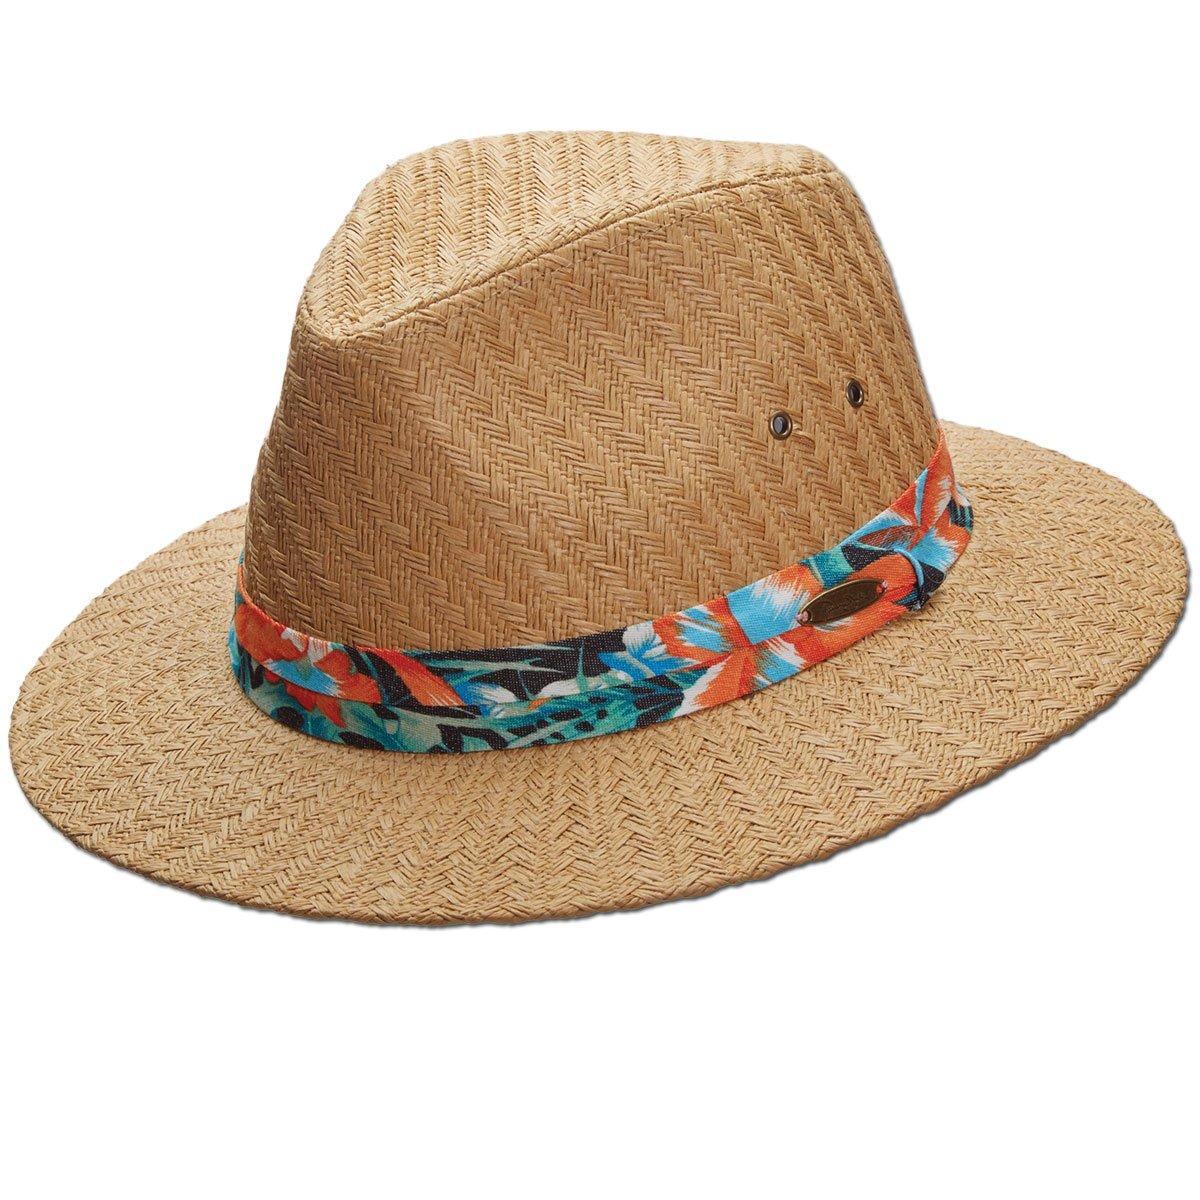 4b0ac9fc0 Panama Jack Tropical Ribbon Matte Toyo Straw Safari Sun Hat, 2 3/4